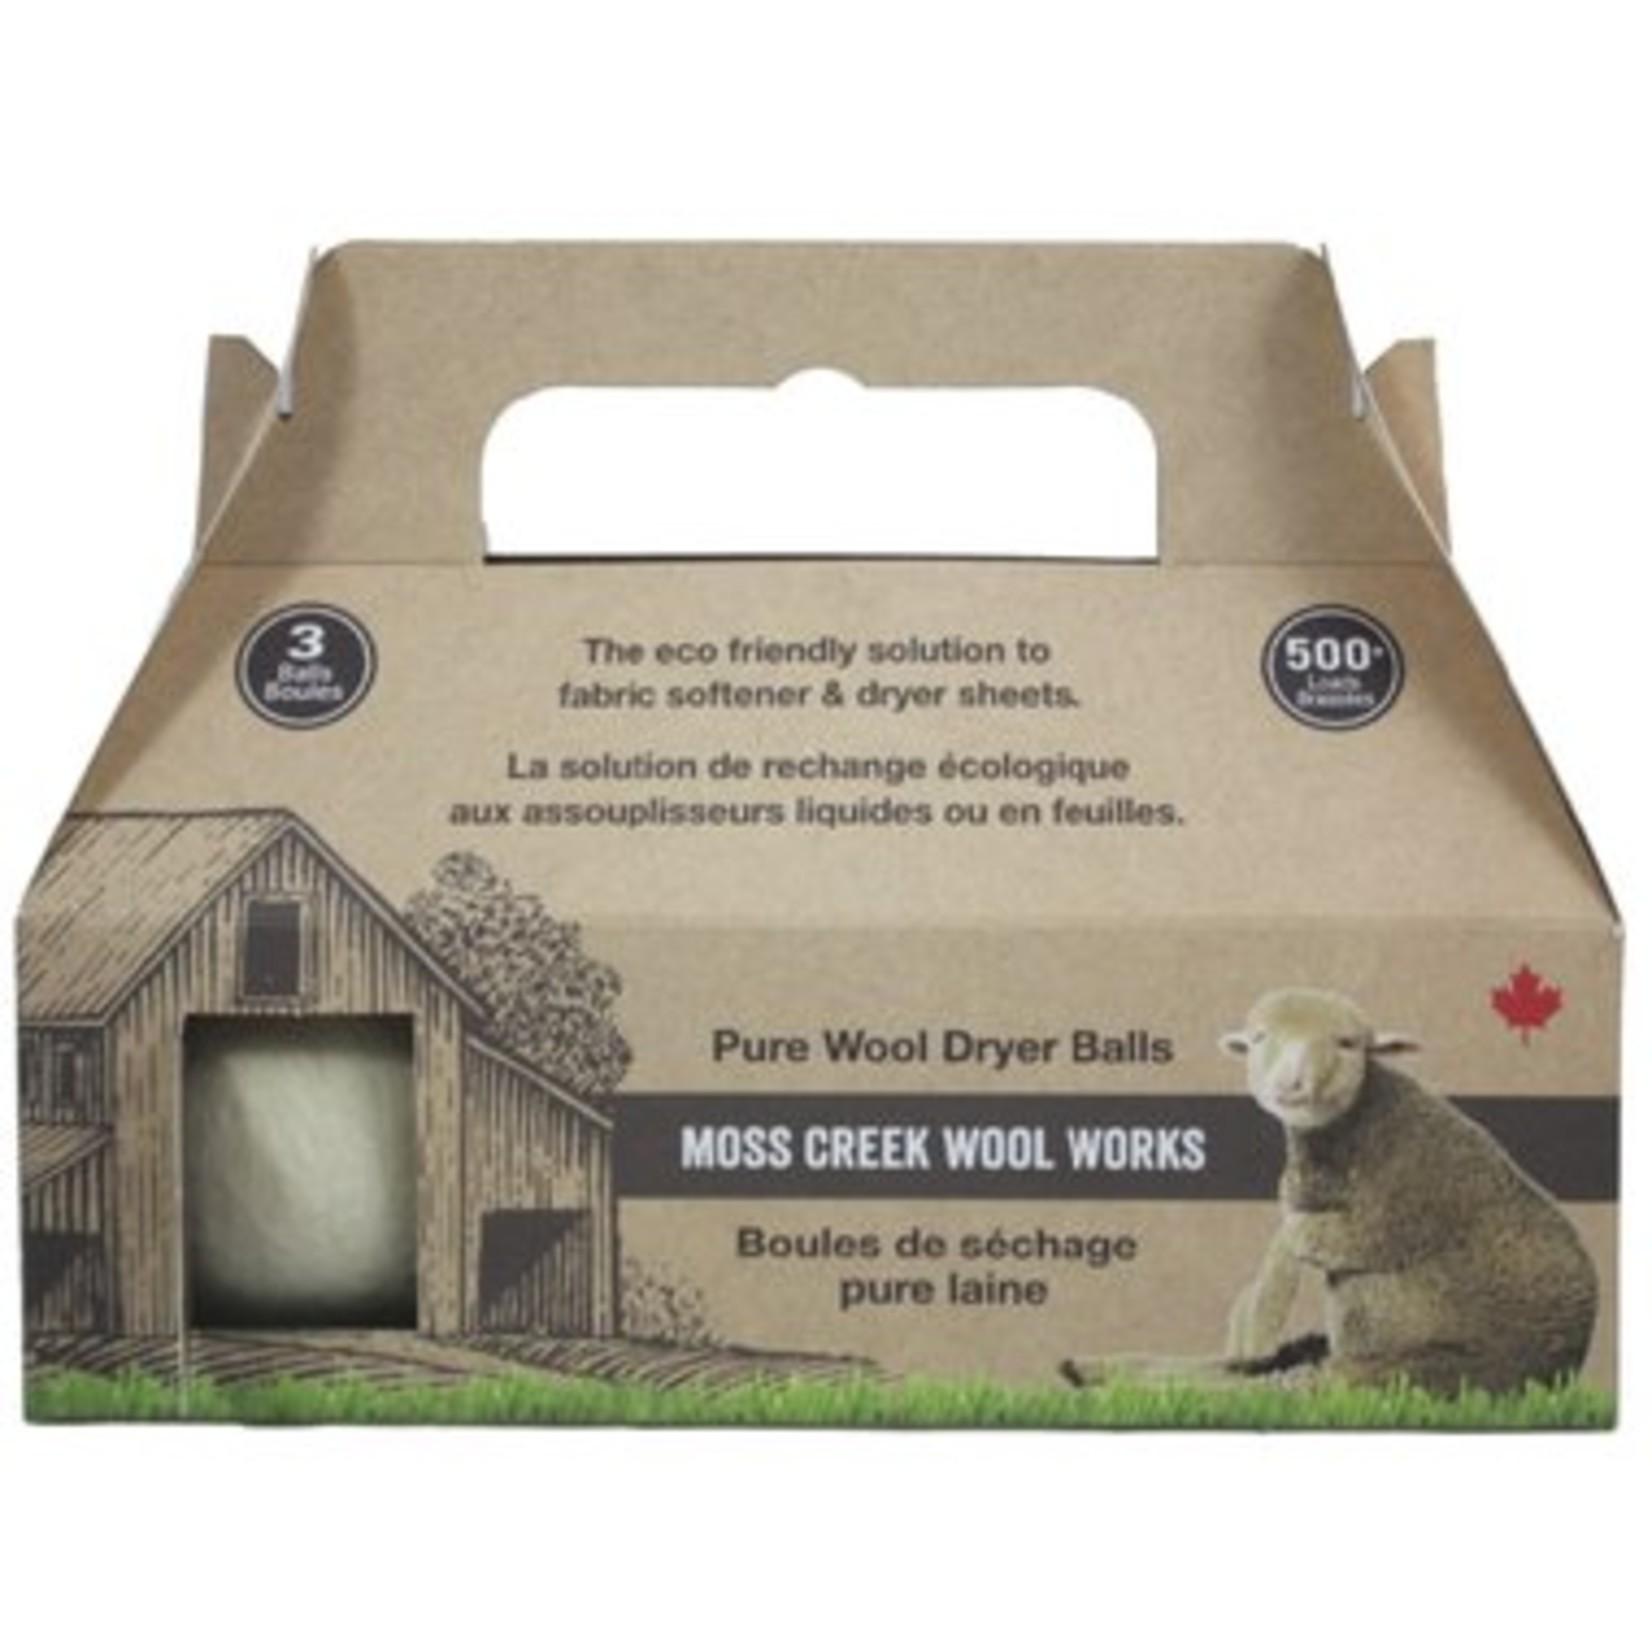 Moss Creek Wool Works Pure Wool Dryer Ball- 3 pack